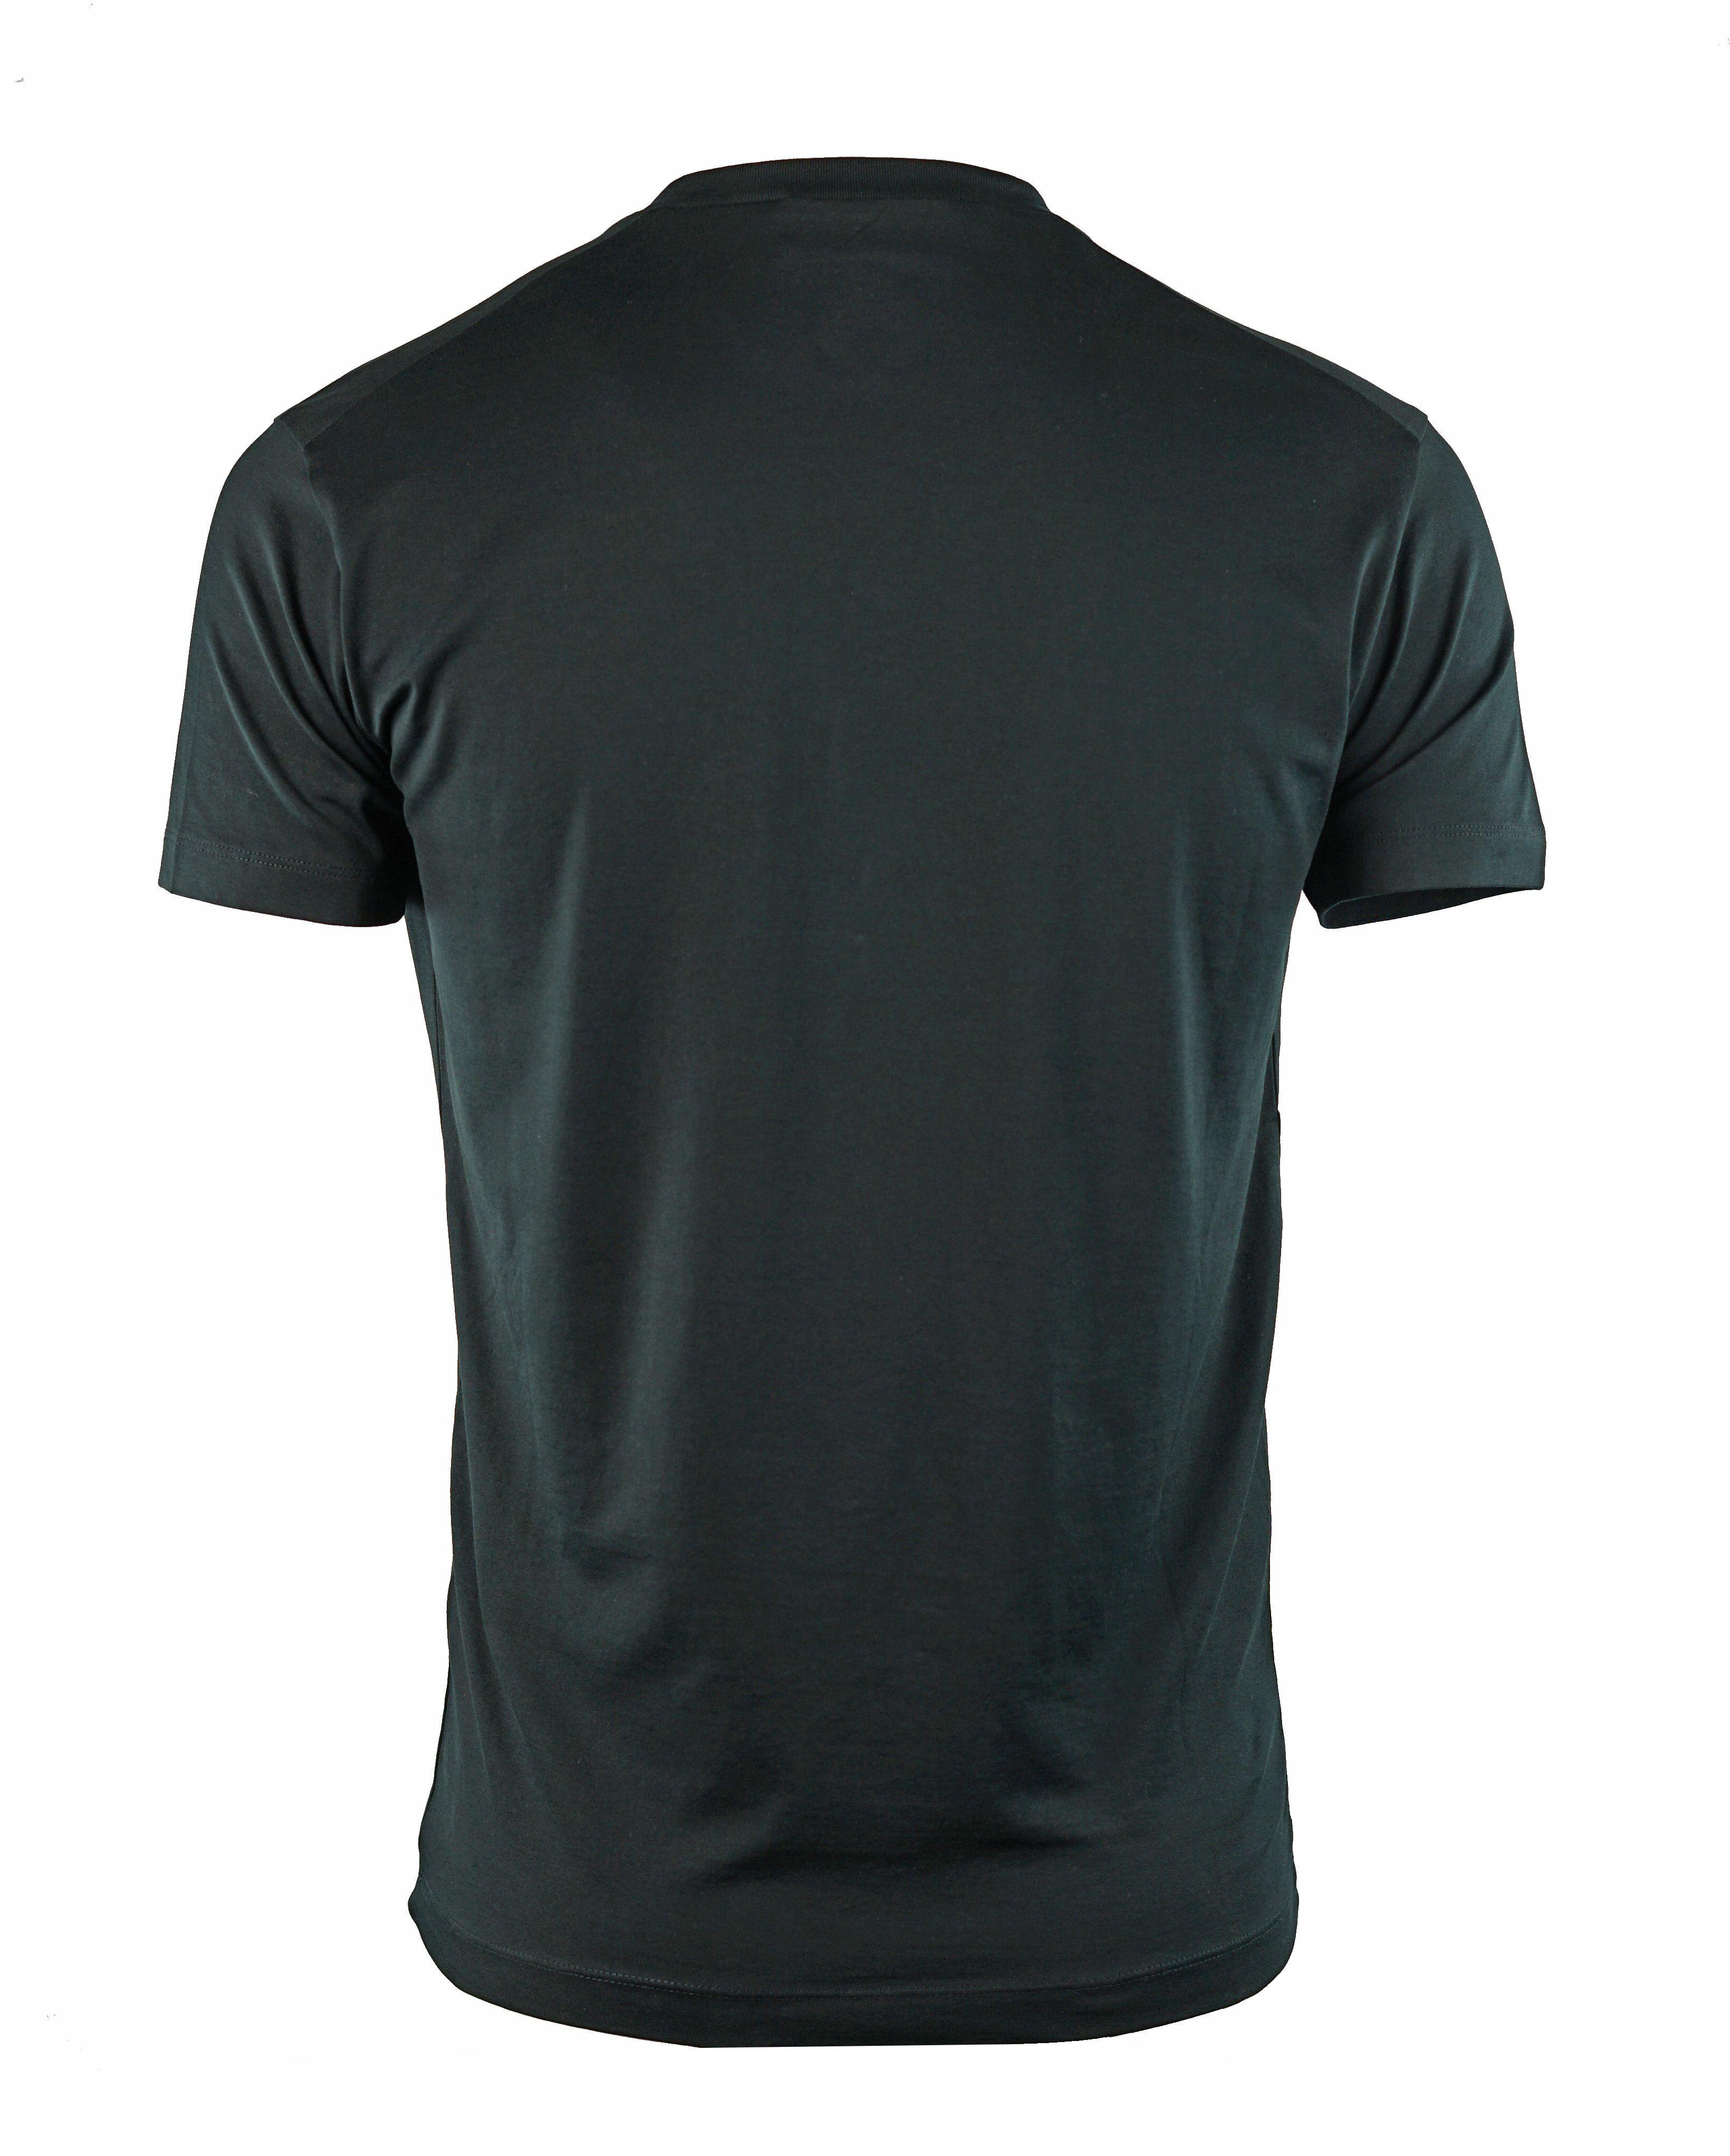 DSquared2 S74GD0412 S22844 900 T-Shirt